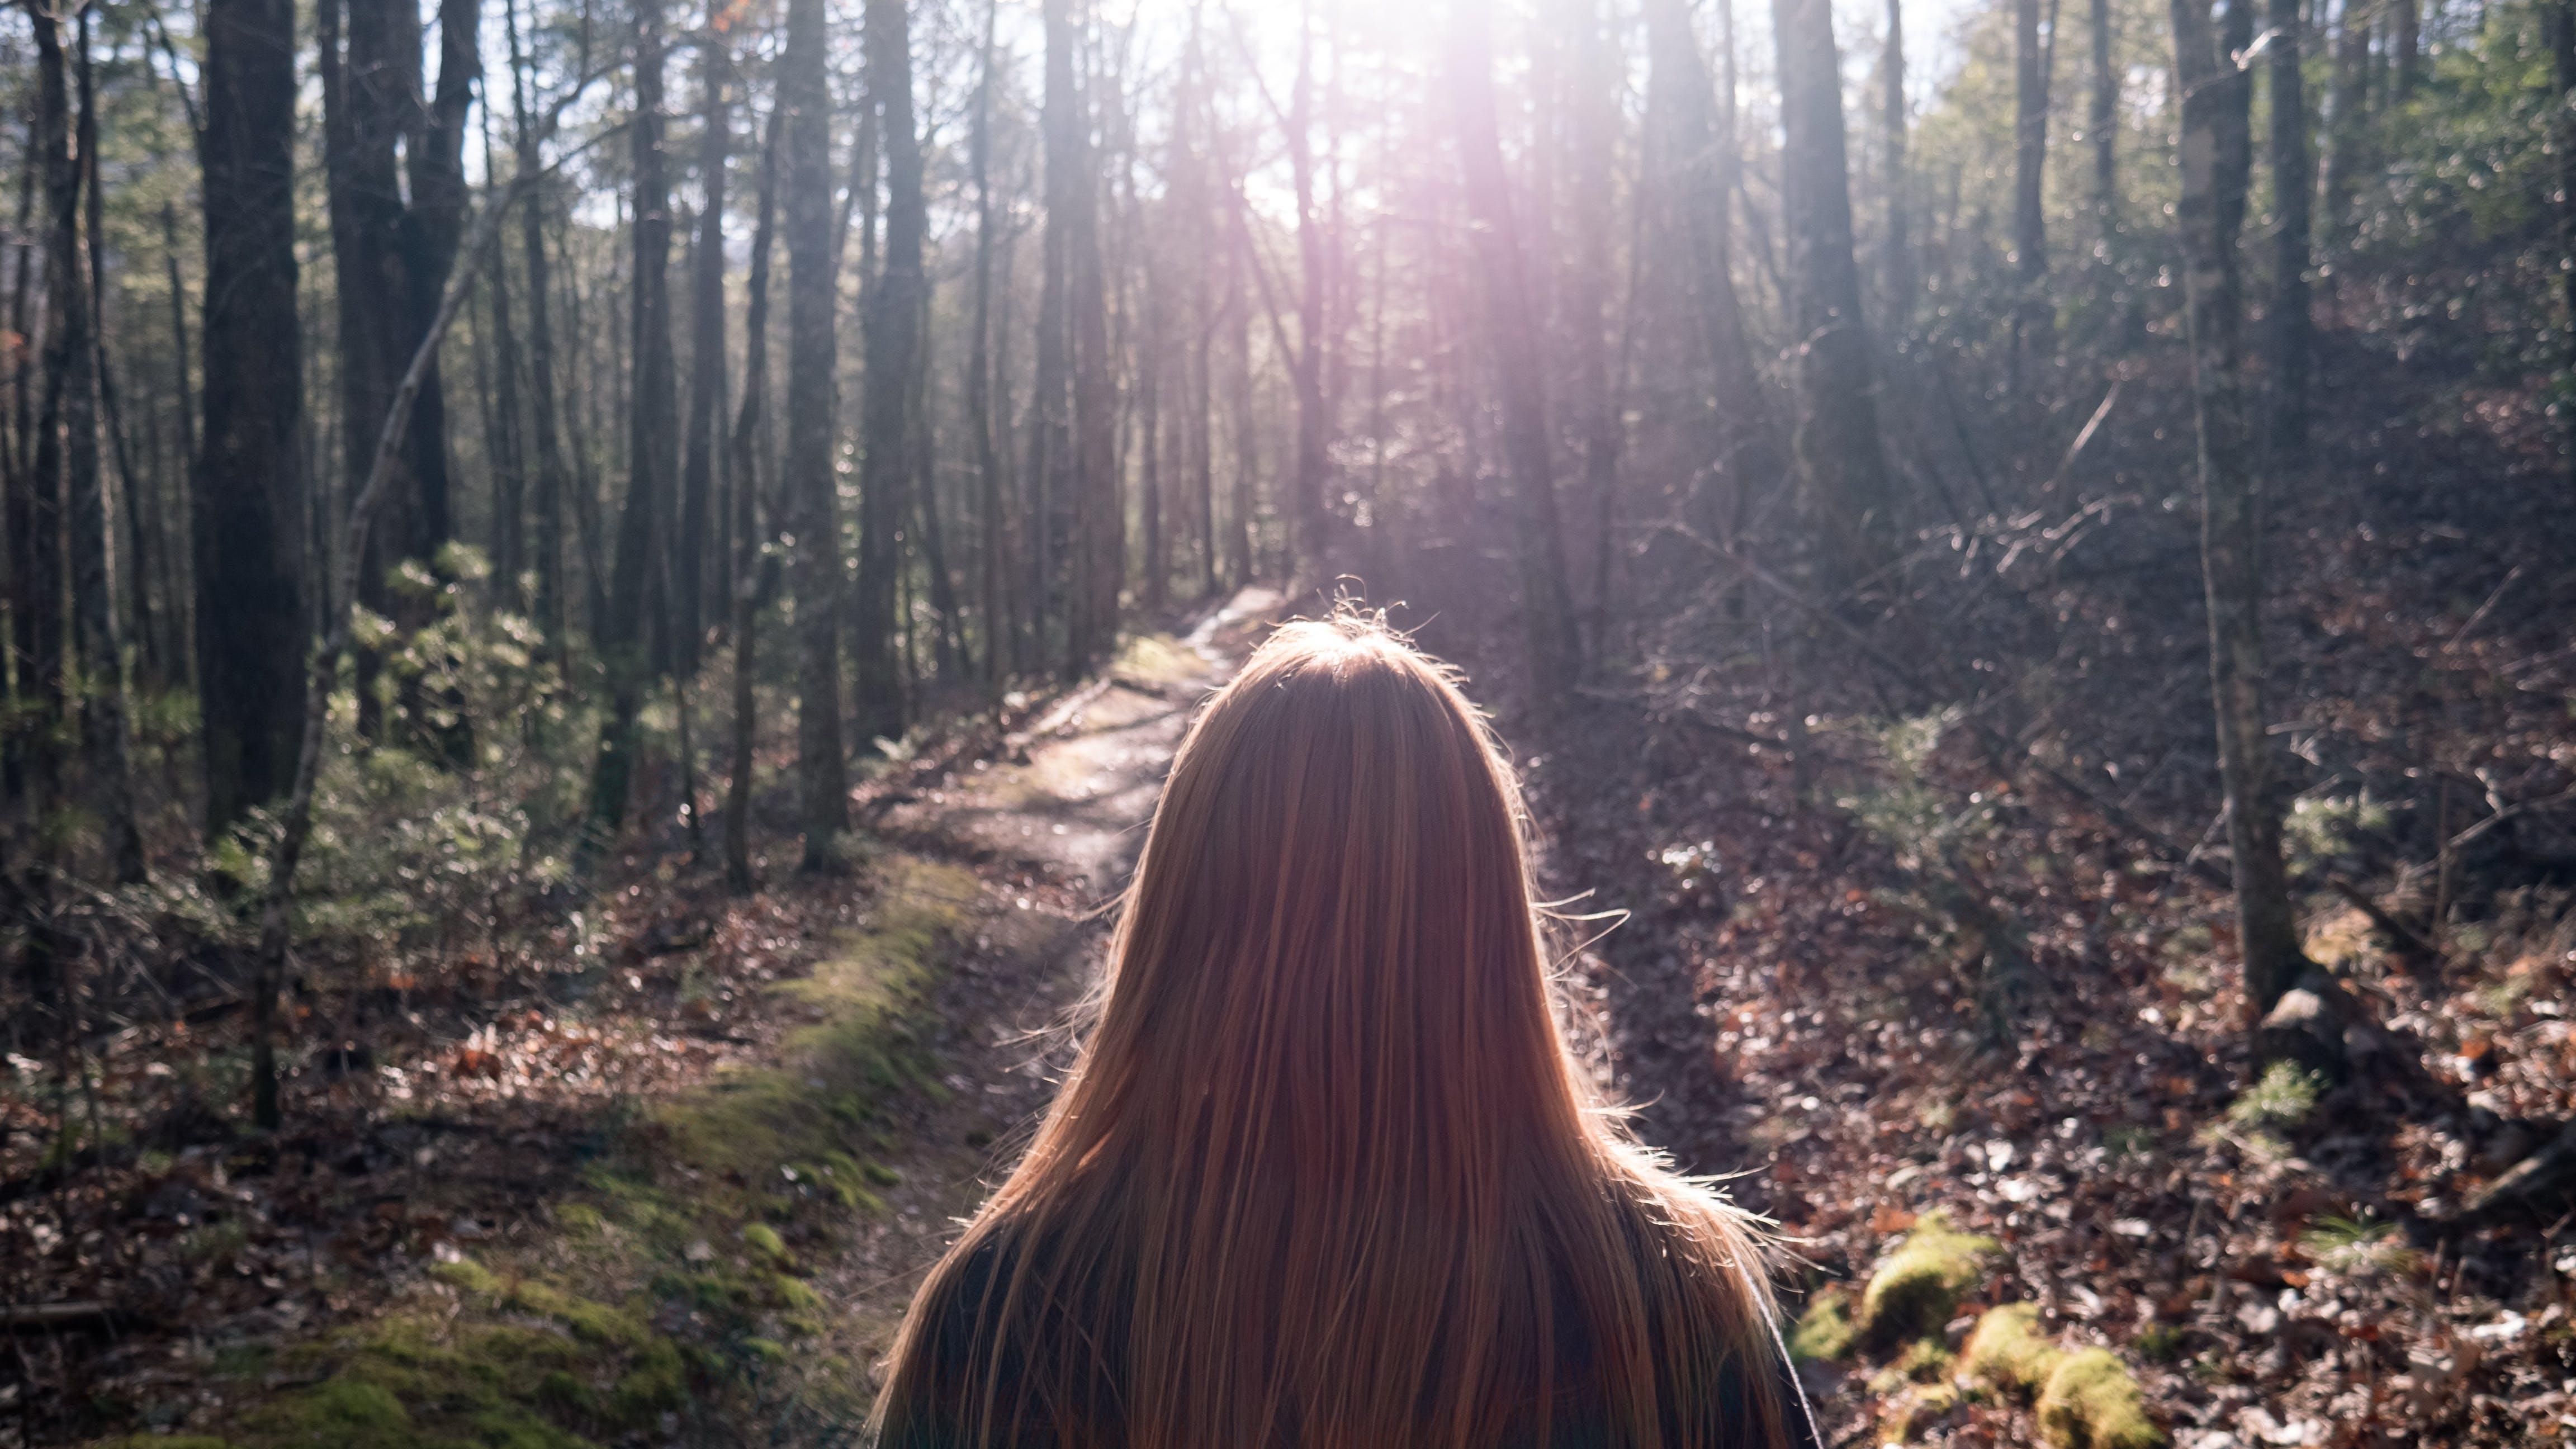 Woman in Black Top Standing Between Trees